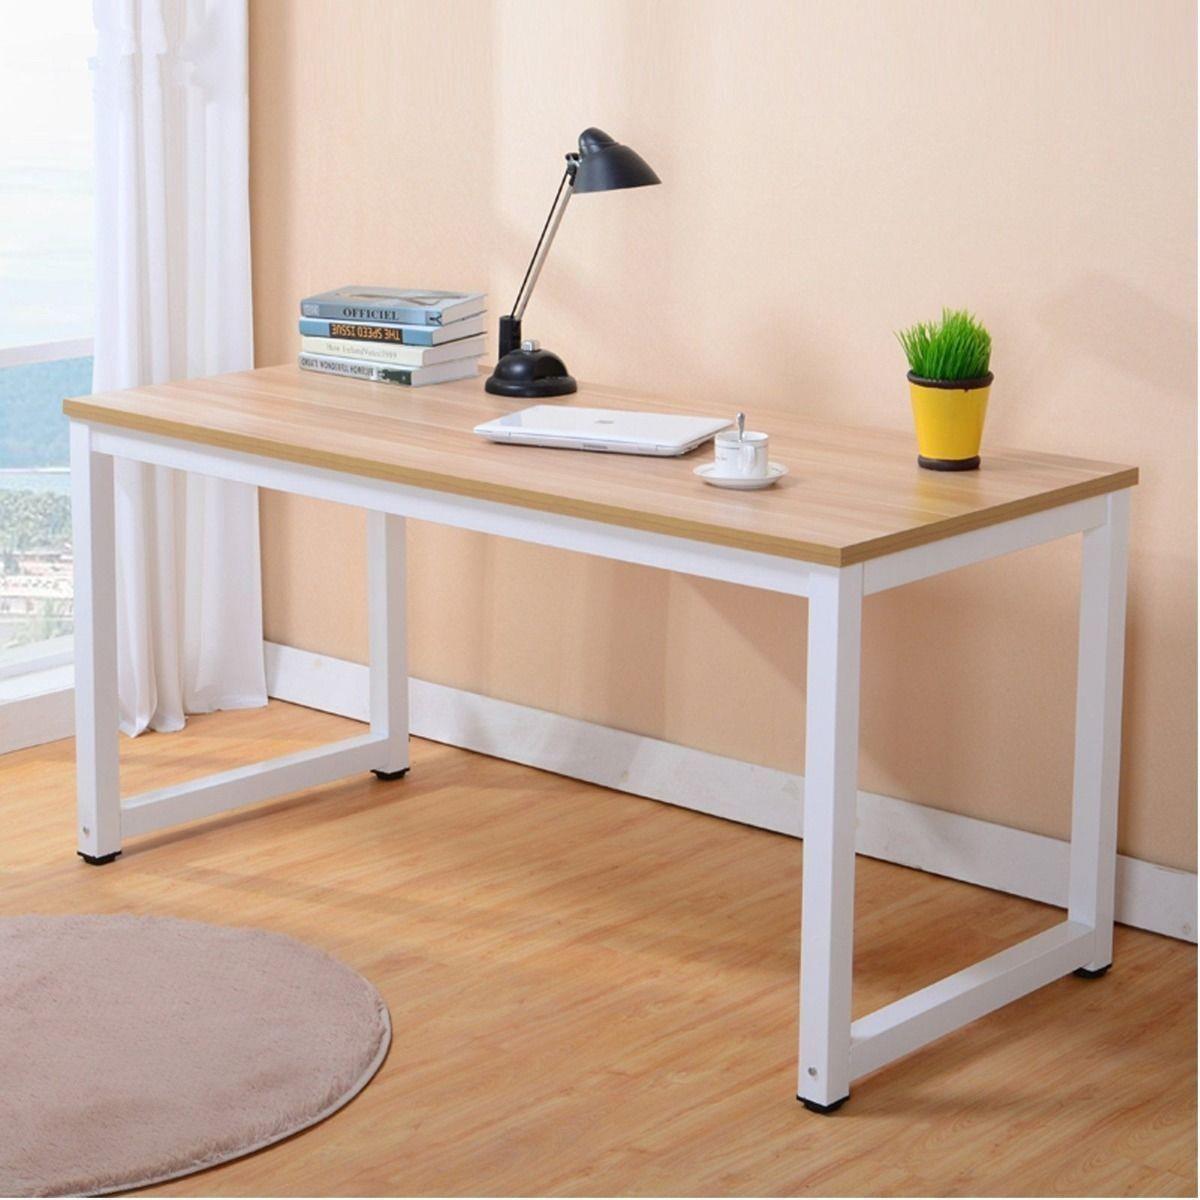 Ktaxon Computer Desk PC Laptop Wood Table Home Office Study Workstation  Furniture - Walmart.com